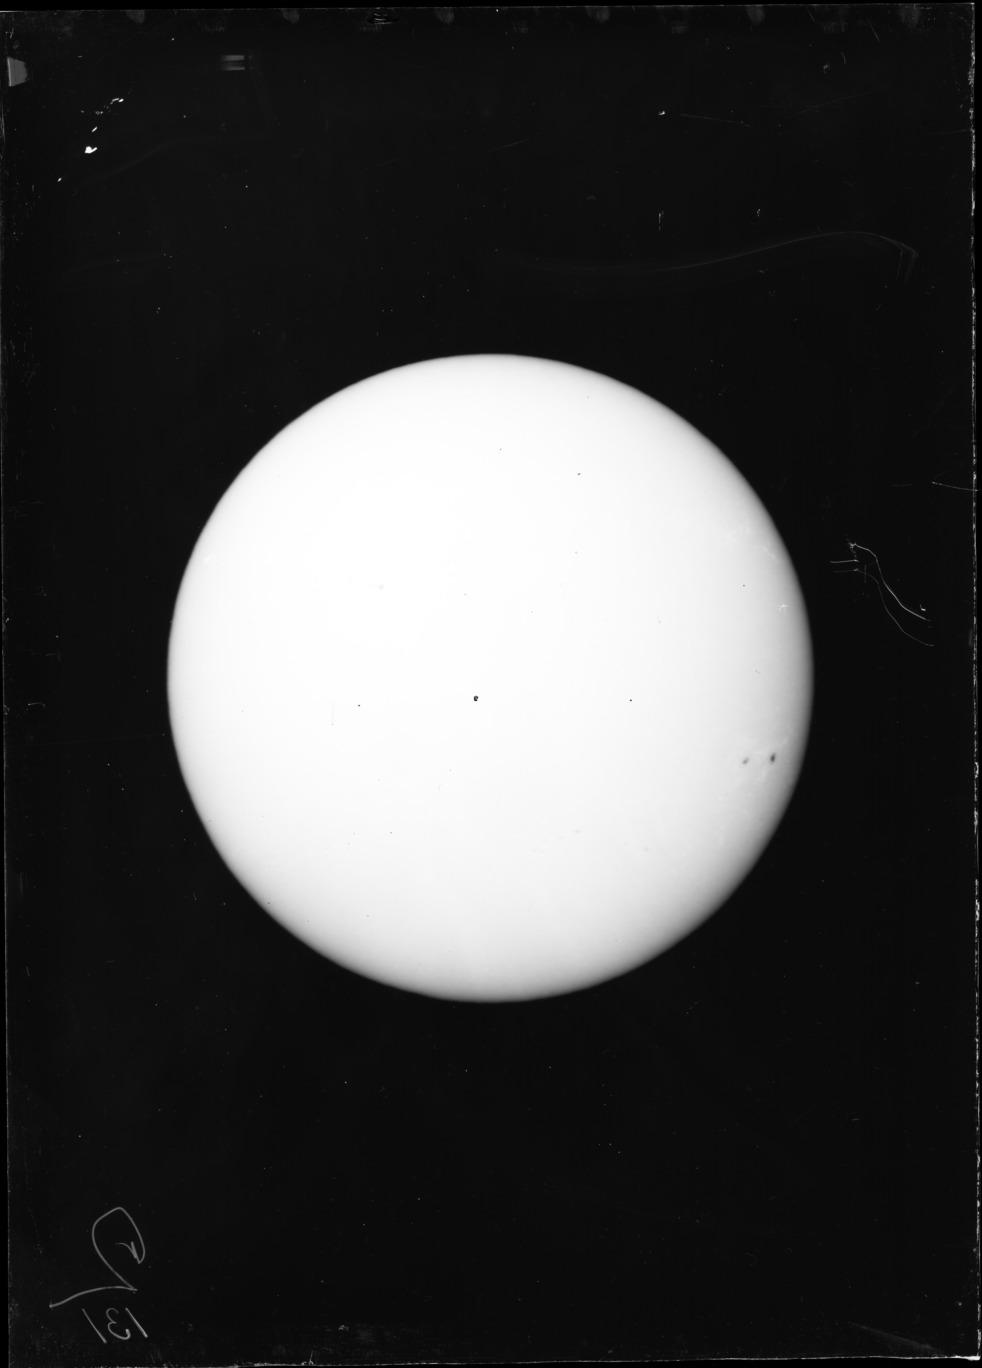 AGlV131